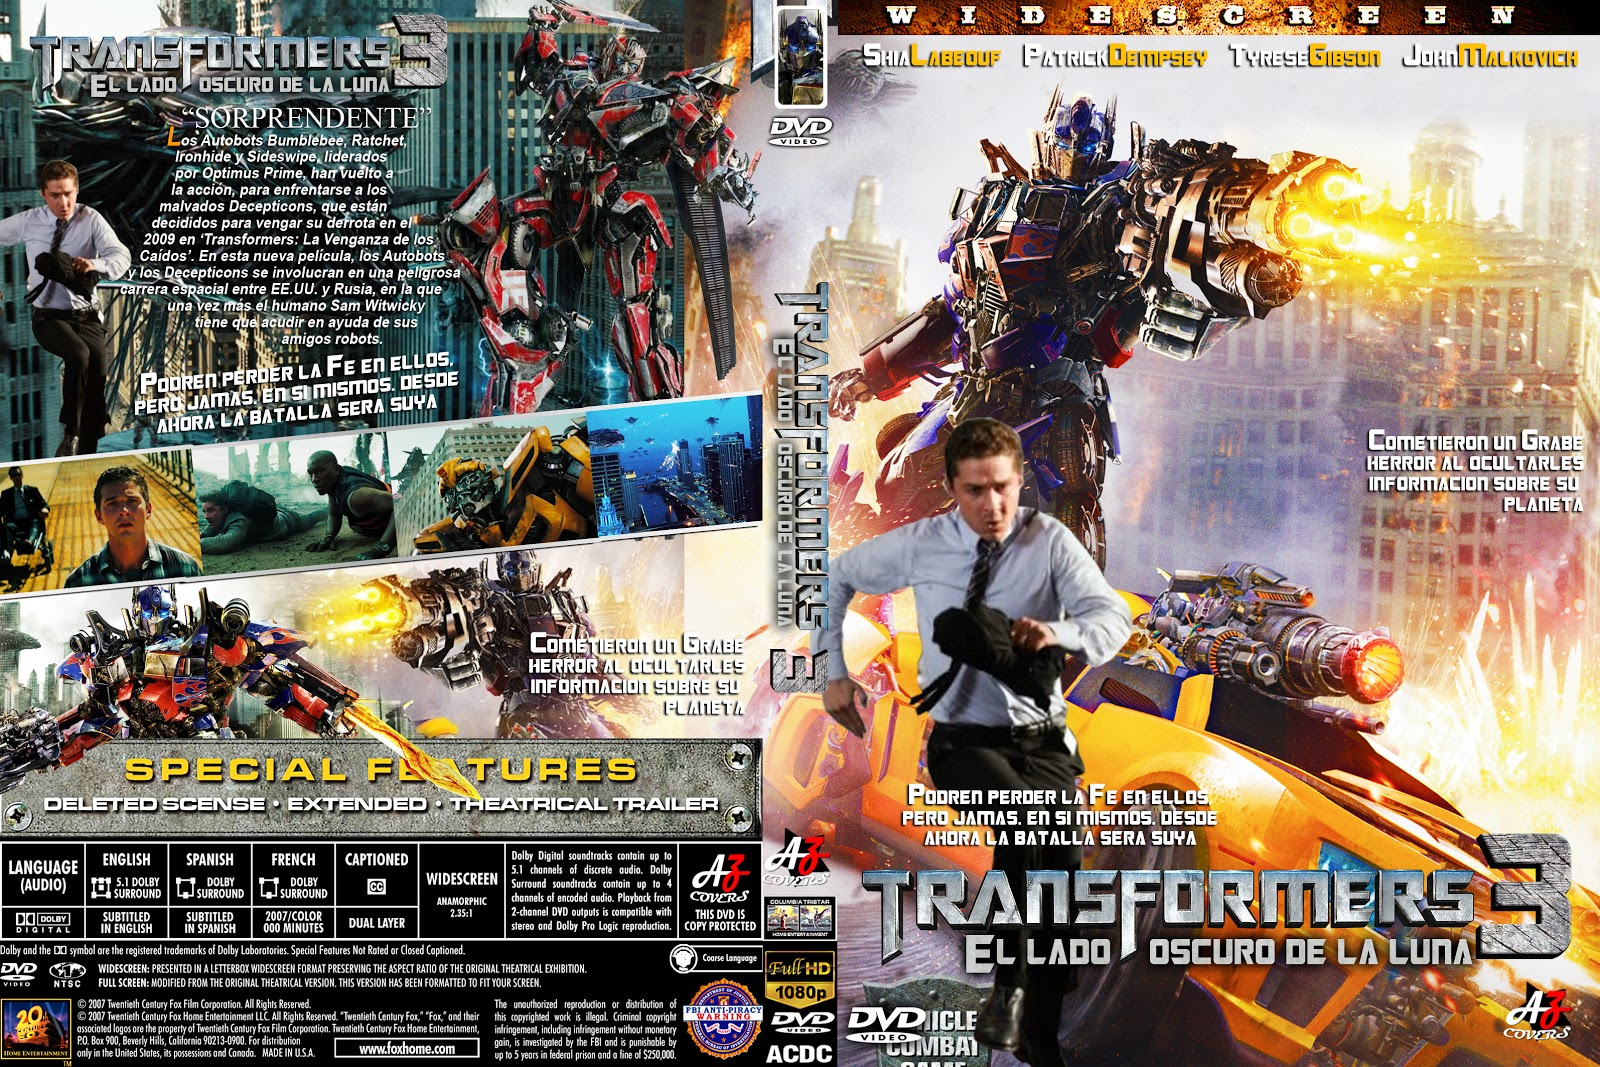 download transformers 3 dvd full / yes man subtitles english online